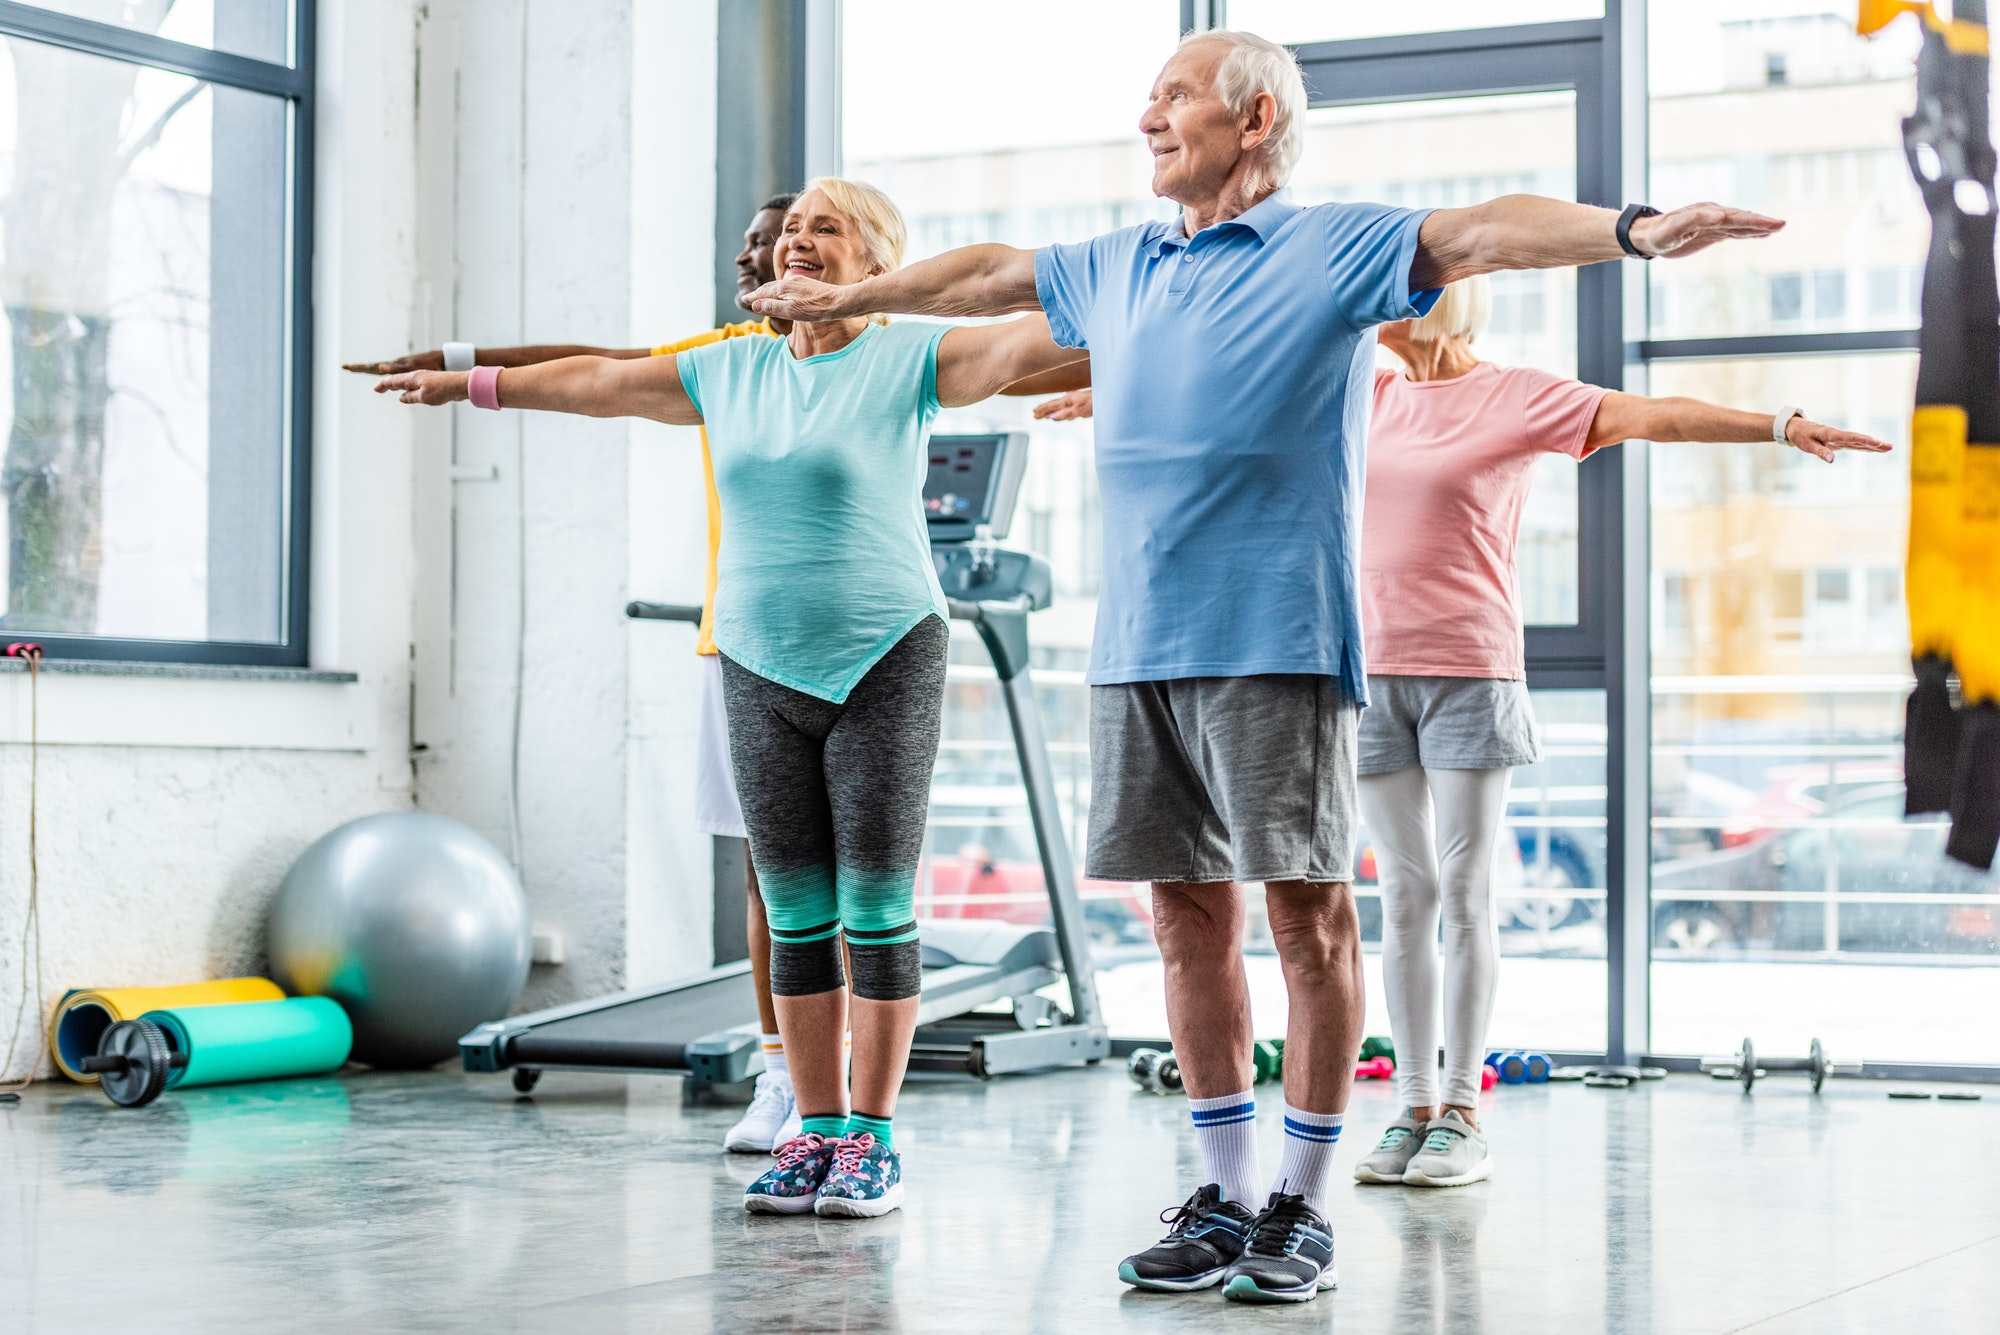 multiethnic senior athletes synchronous doing exercise at sports hall